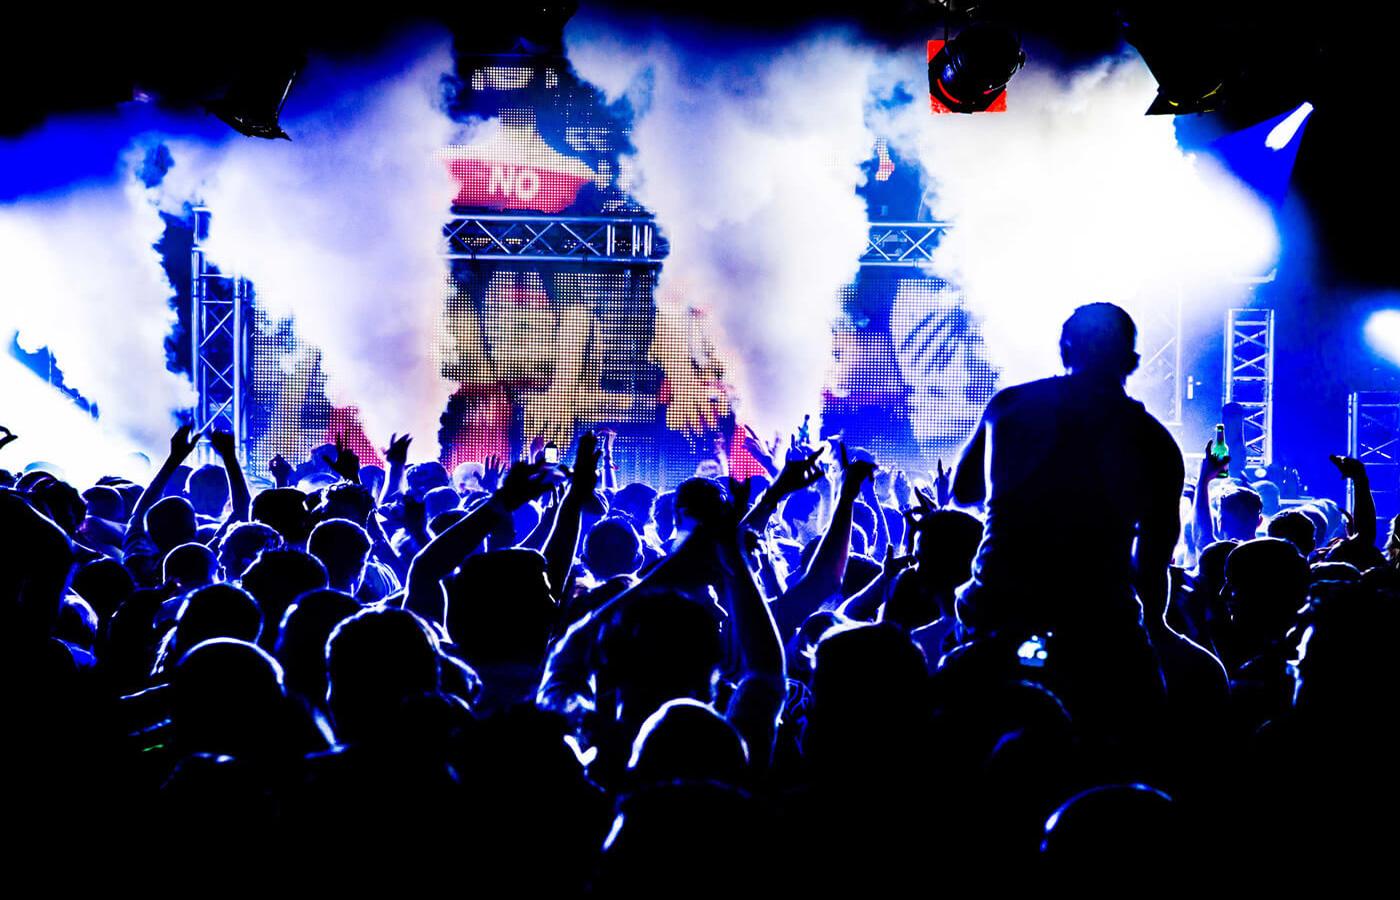 360 entertainment events